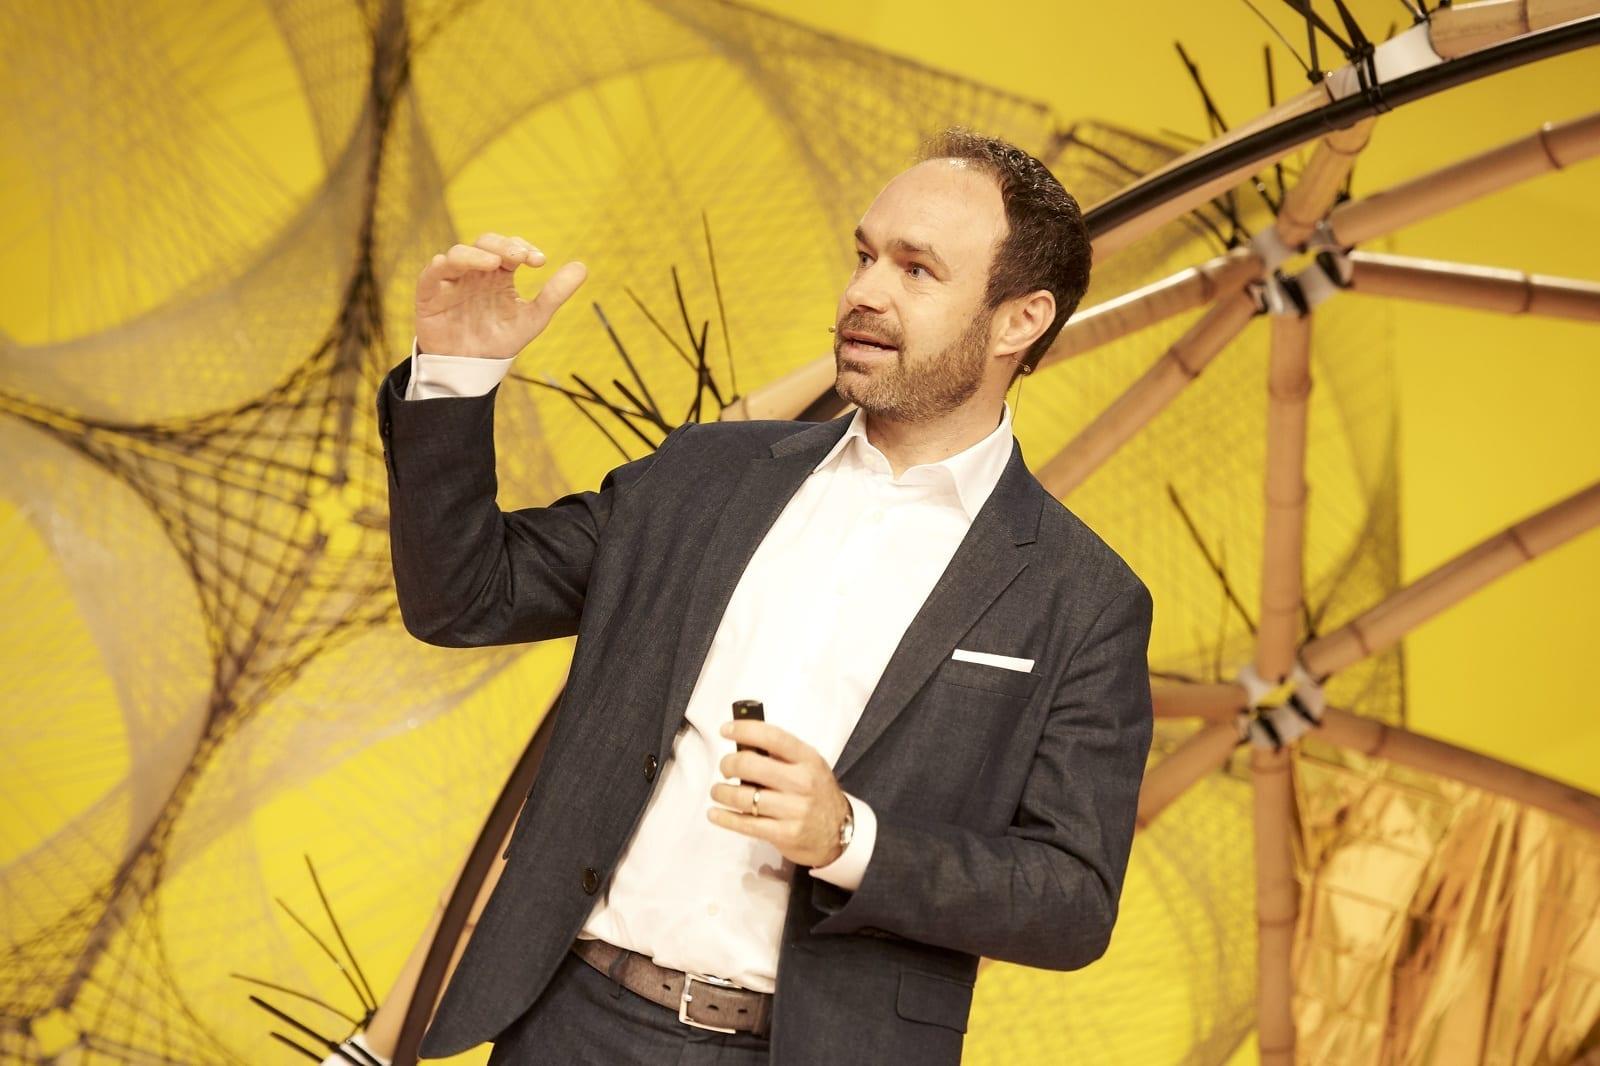 Future Day Presentation - Simon Sagmeister - Business Culture Institute